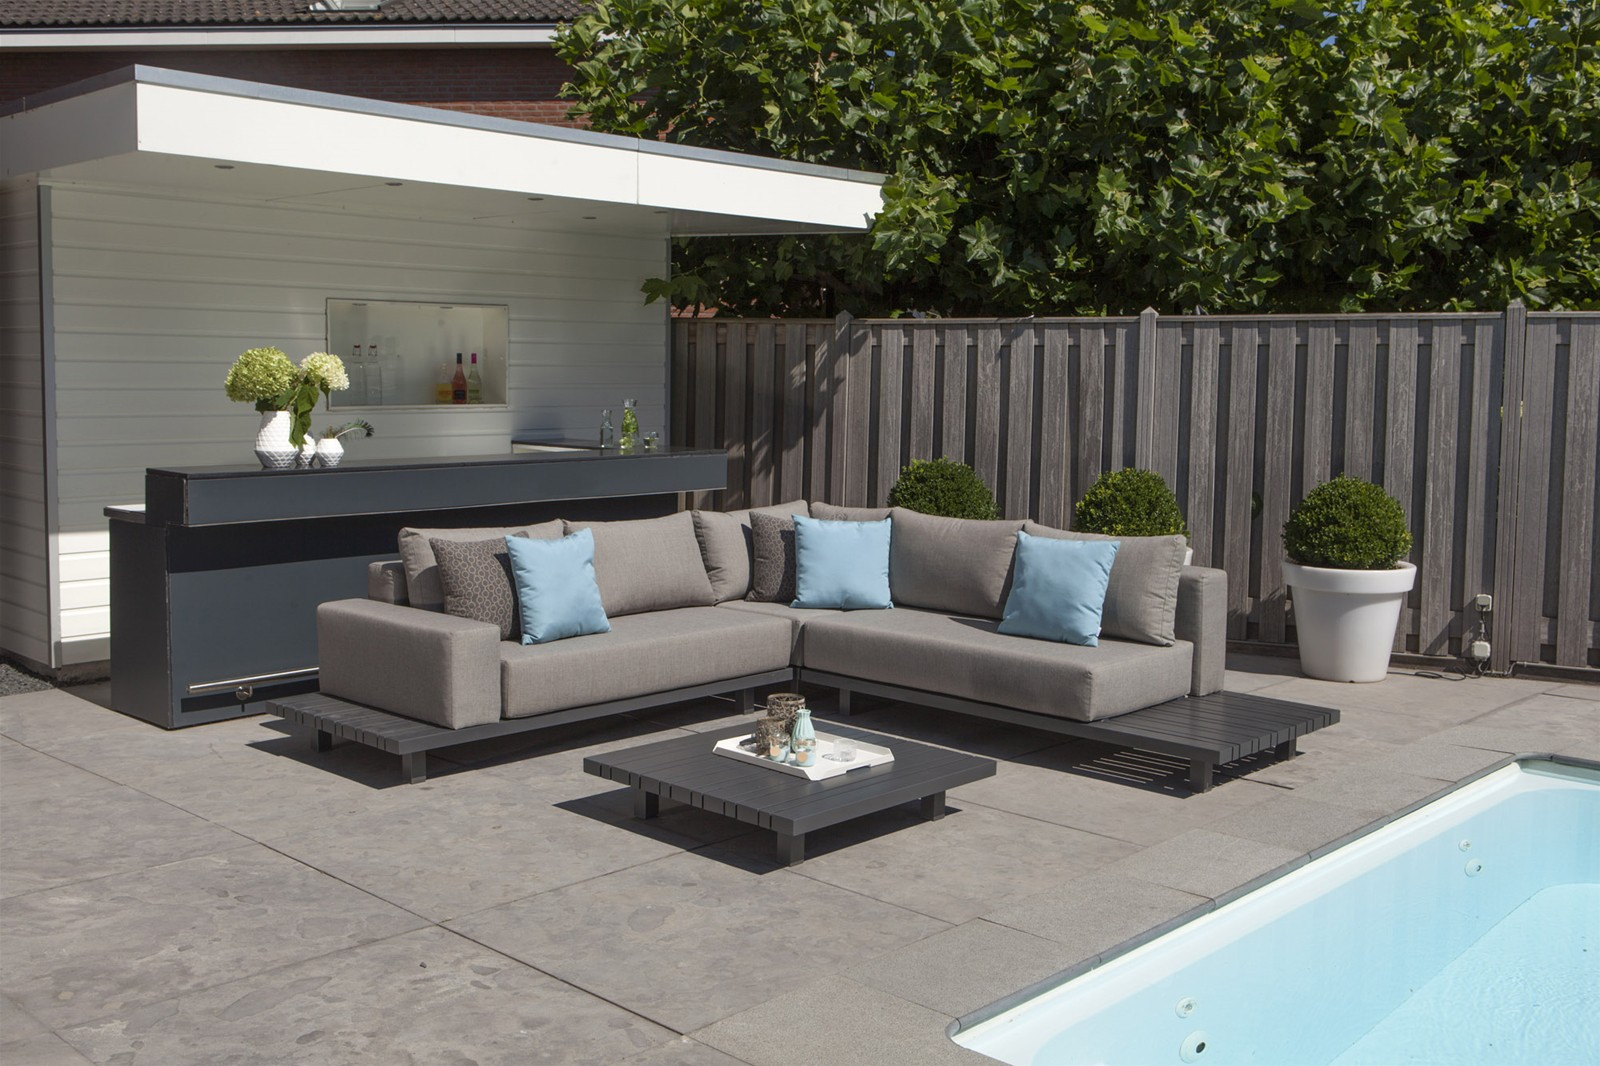 Gartenlounge  Chill Lounge Paradiso Lounge - Outdoor Gartenlounge - Aluminium ...